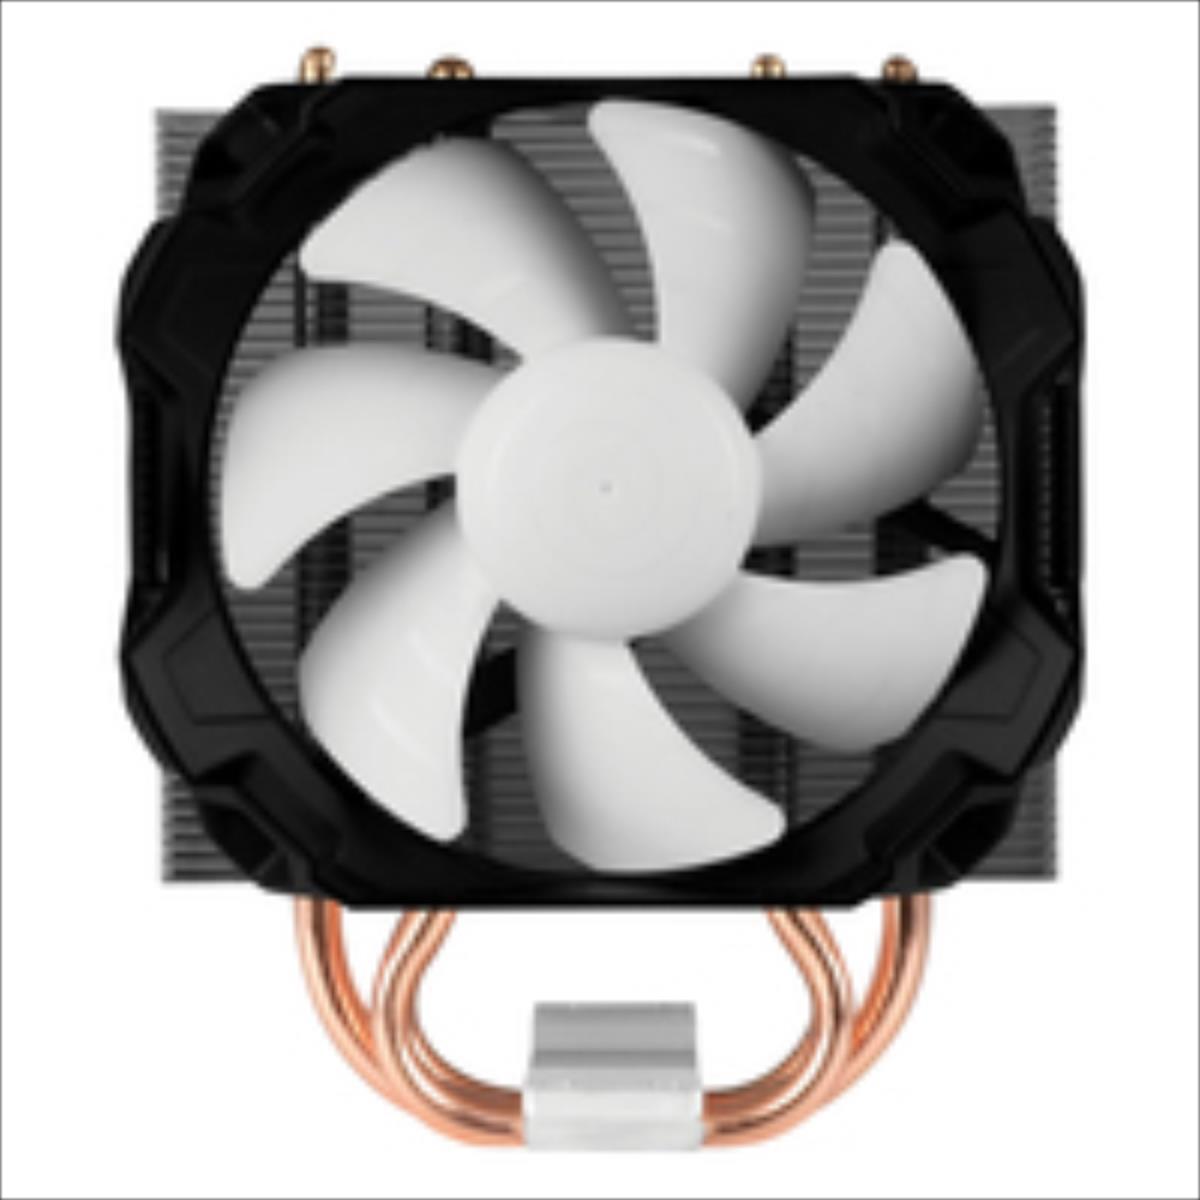 Arctic Freezer i11, CPU cooler, Intel socket 2011, 1155, 1156, 1150 dzesētājs, ventilators